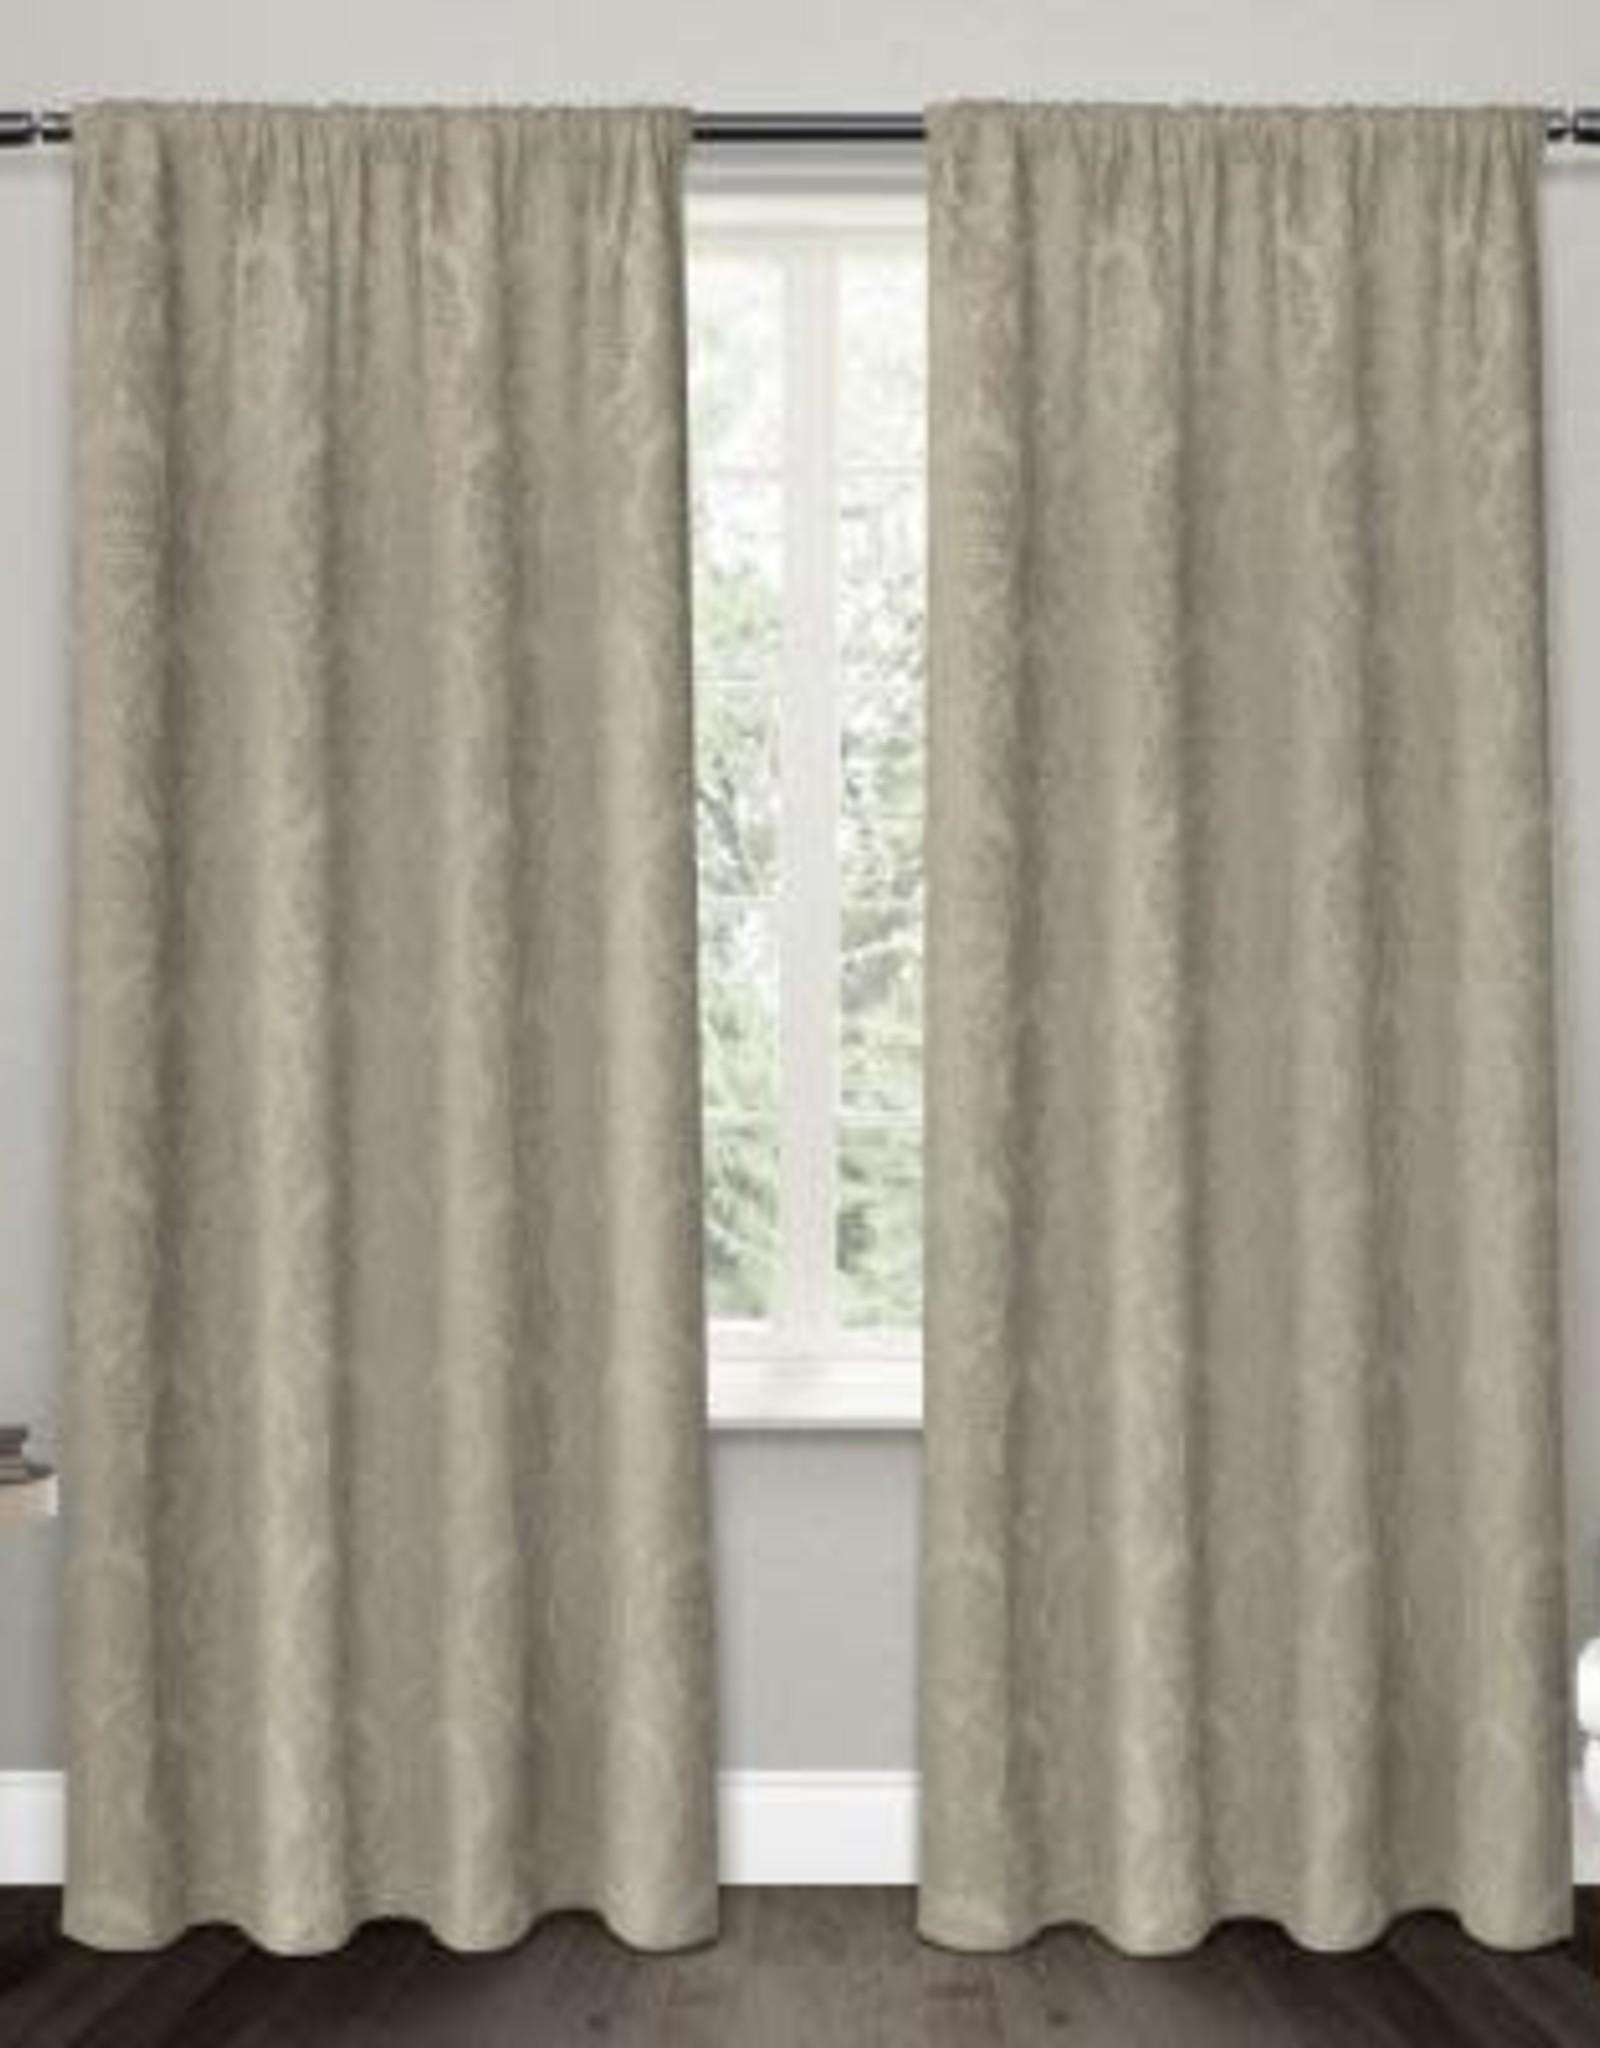 Curtains CasaDecor Taupe Flore 54x84